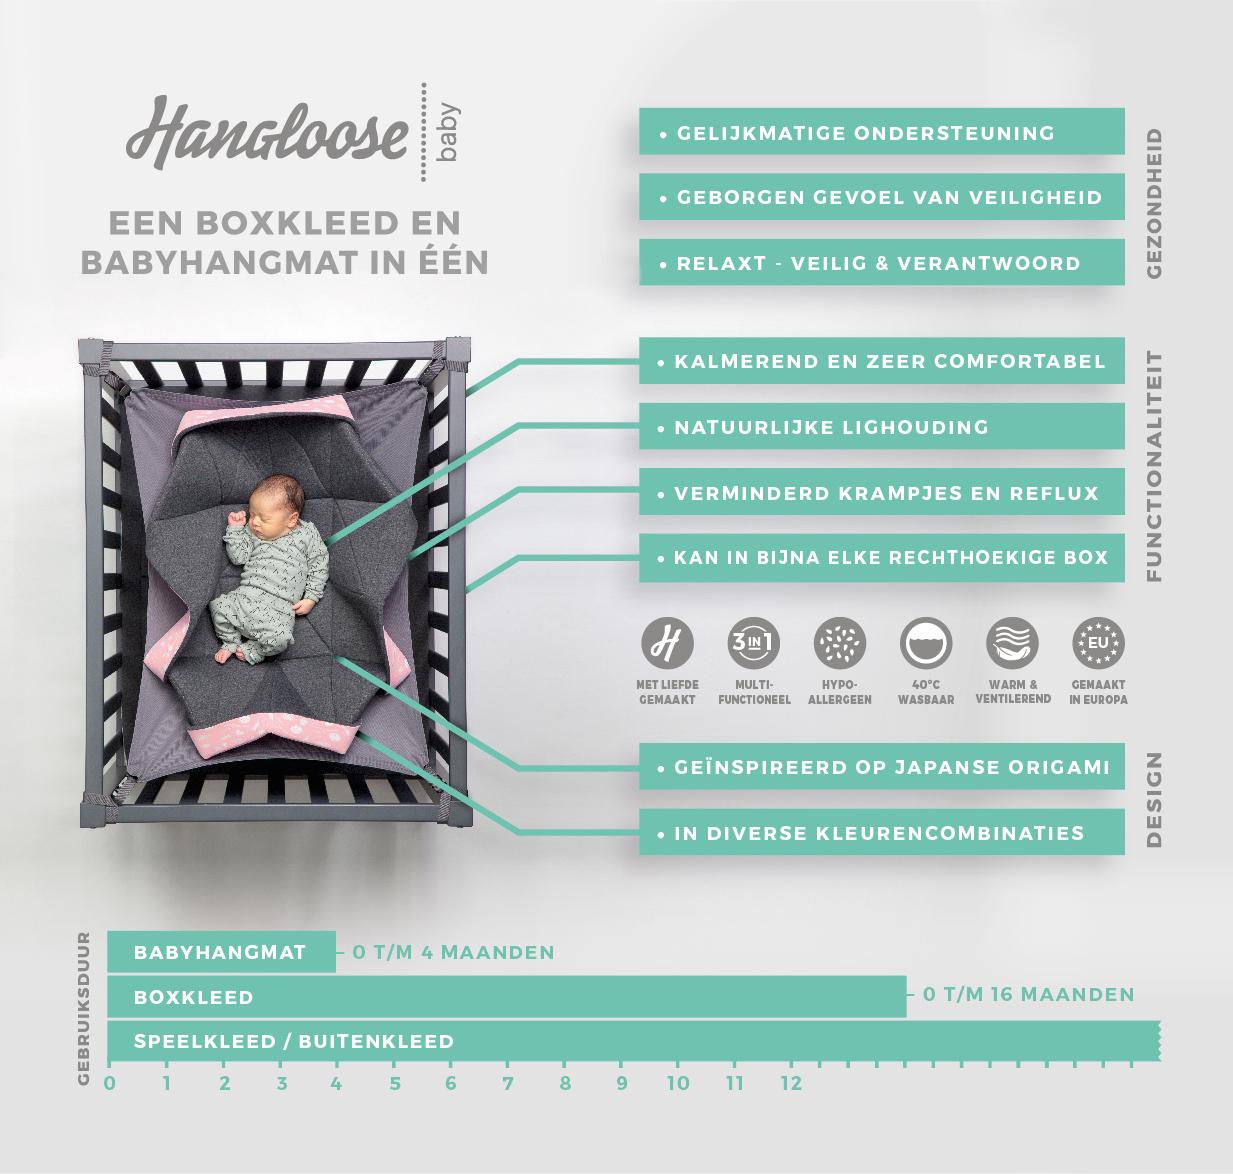 Hangloose baby boxkleed babyhangmat levensduur